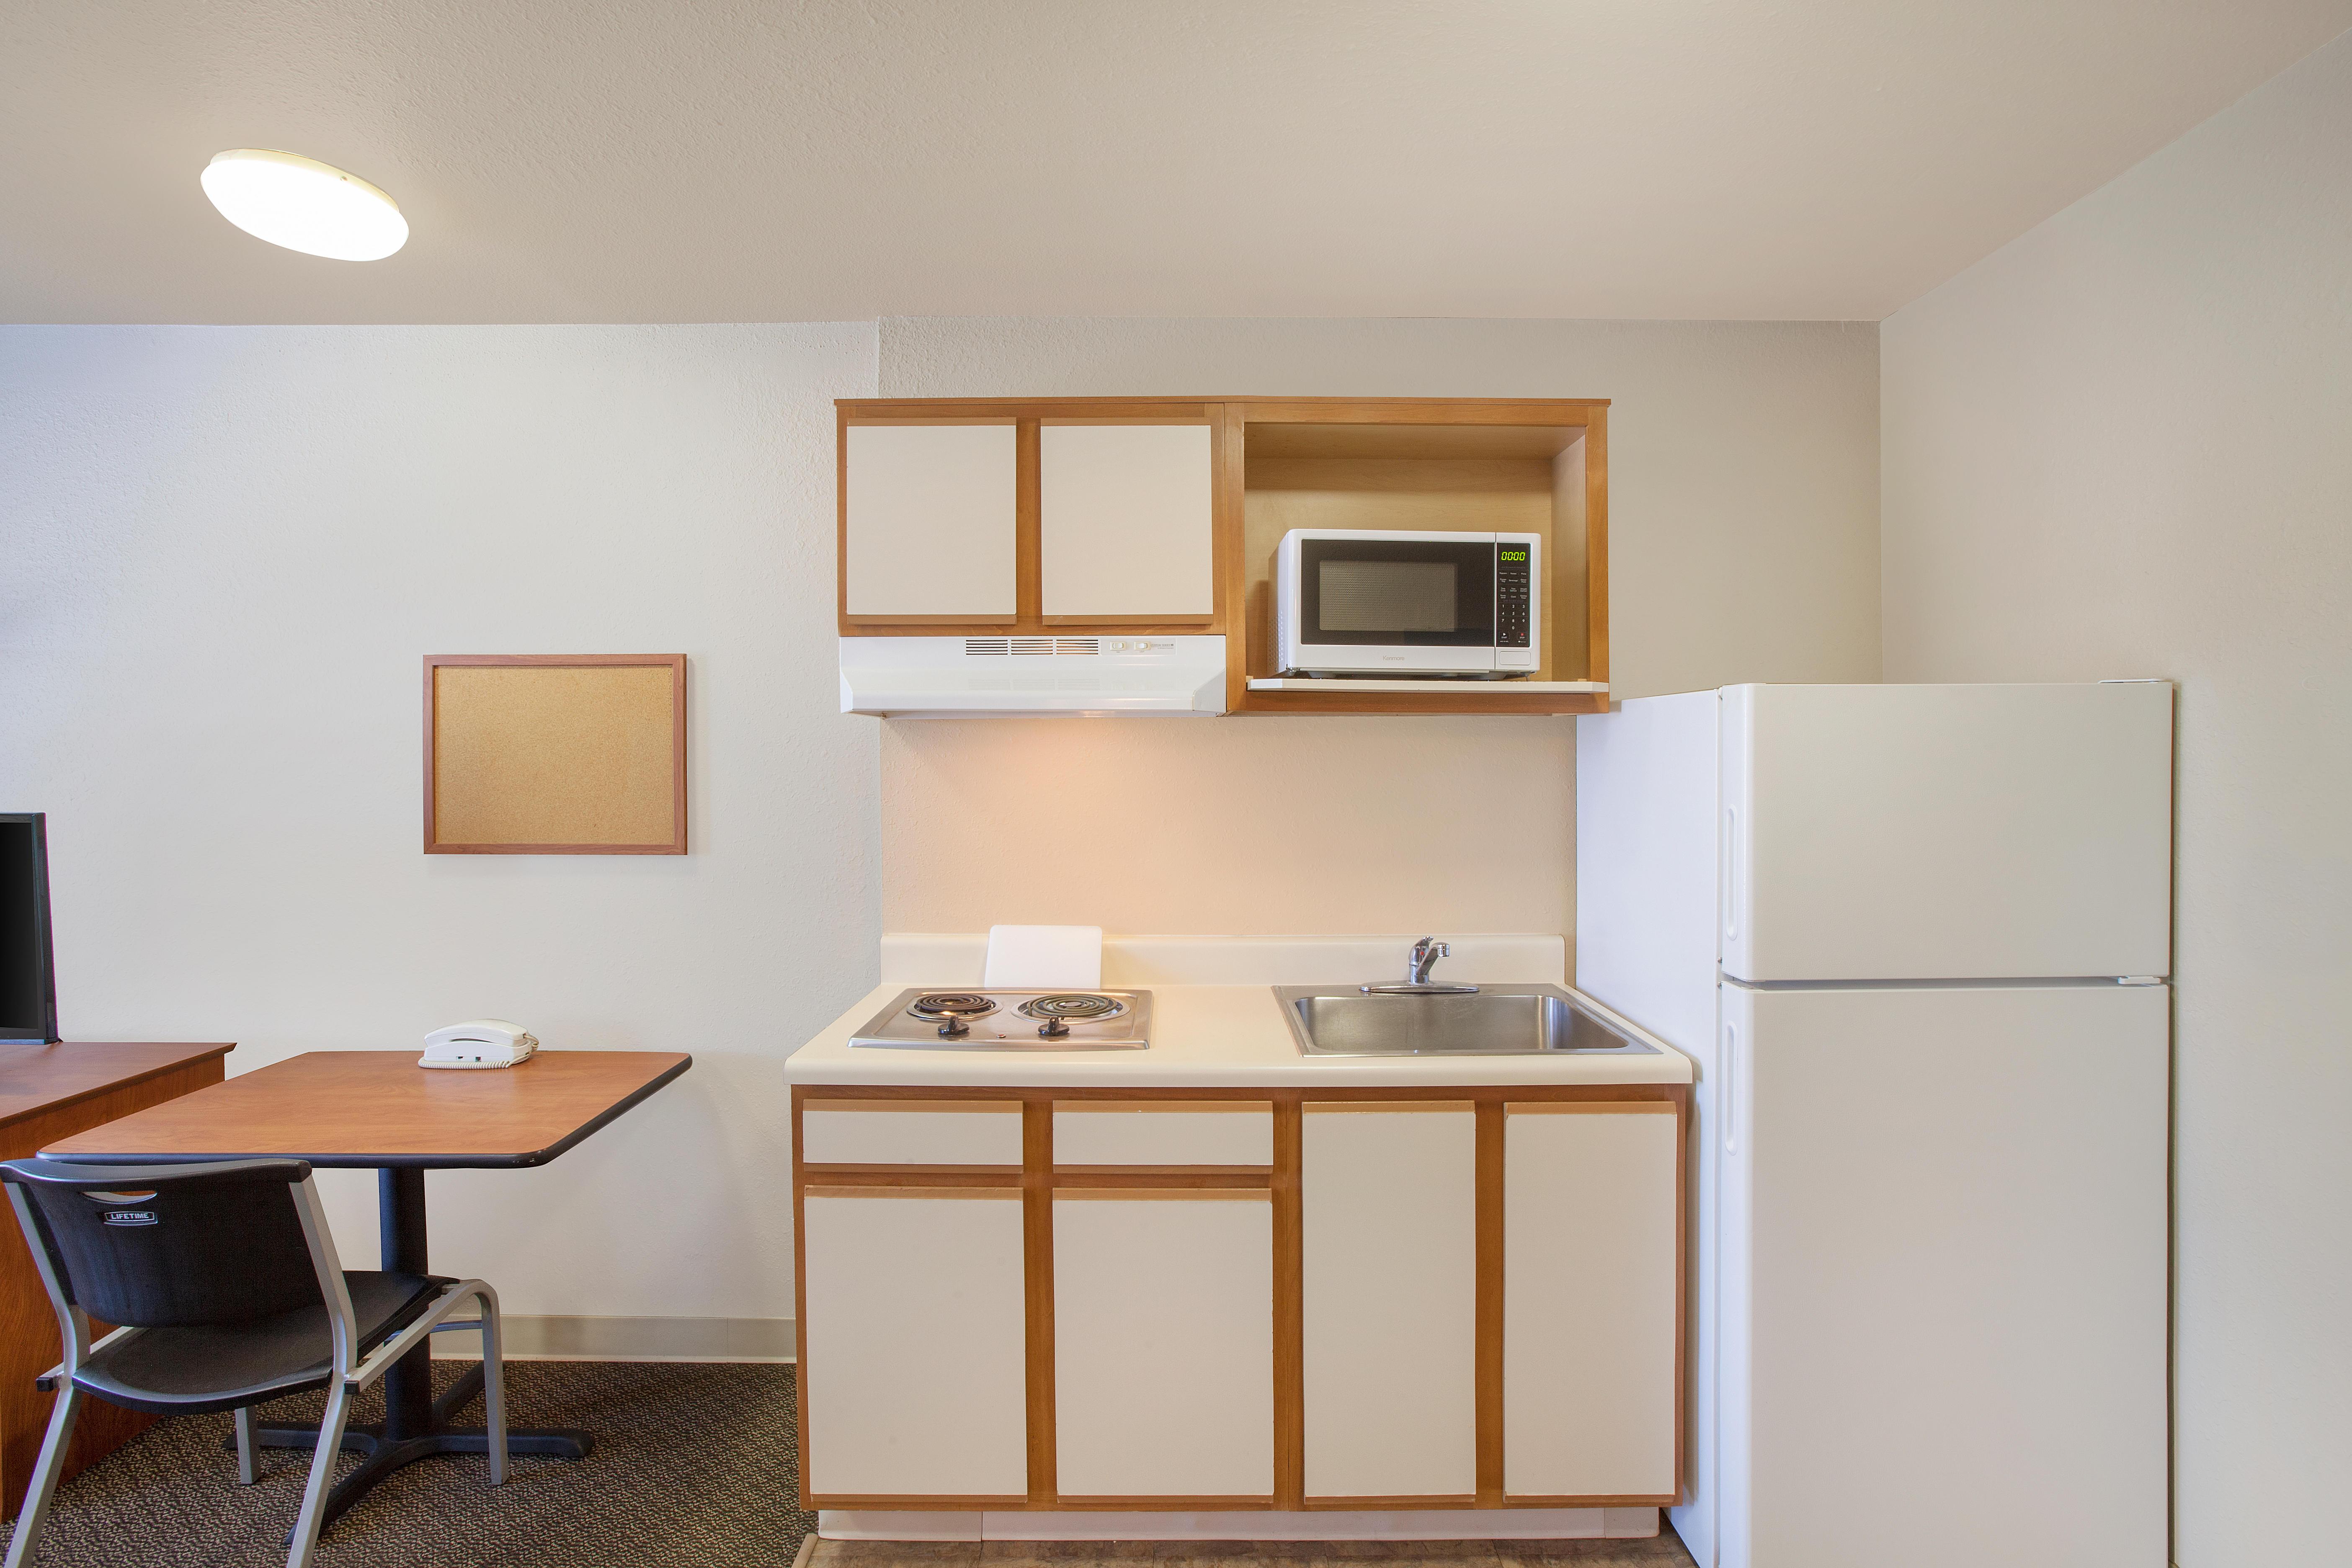 WoodSpring Suites Jacksonville Southeast image 5